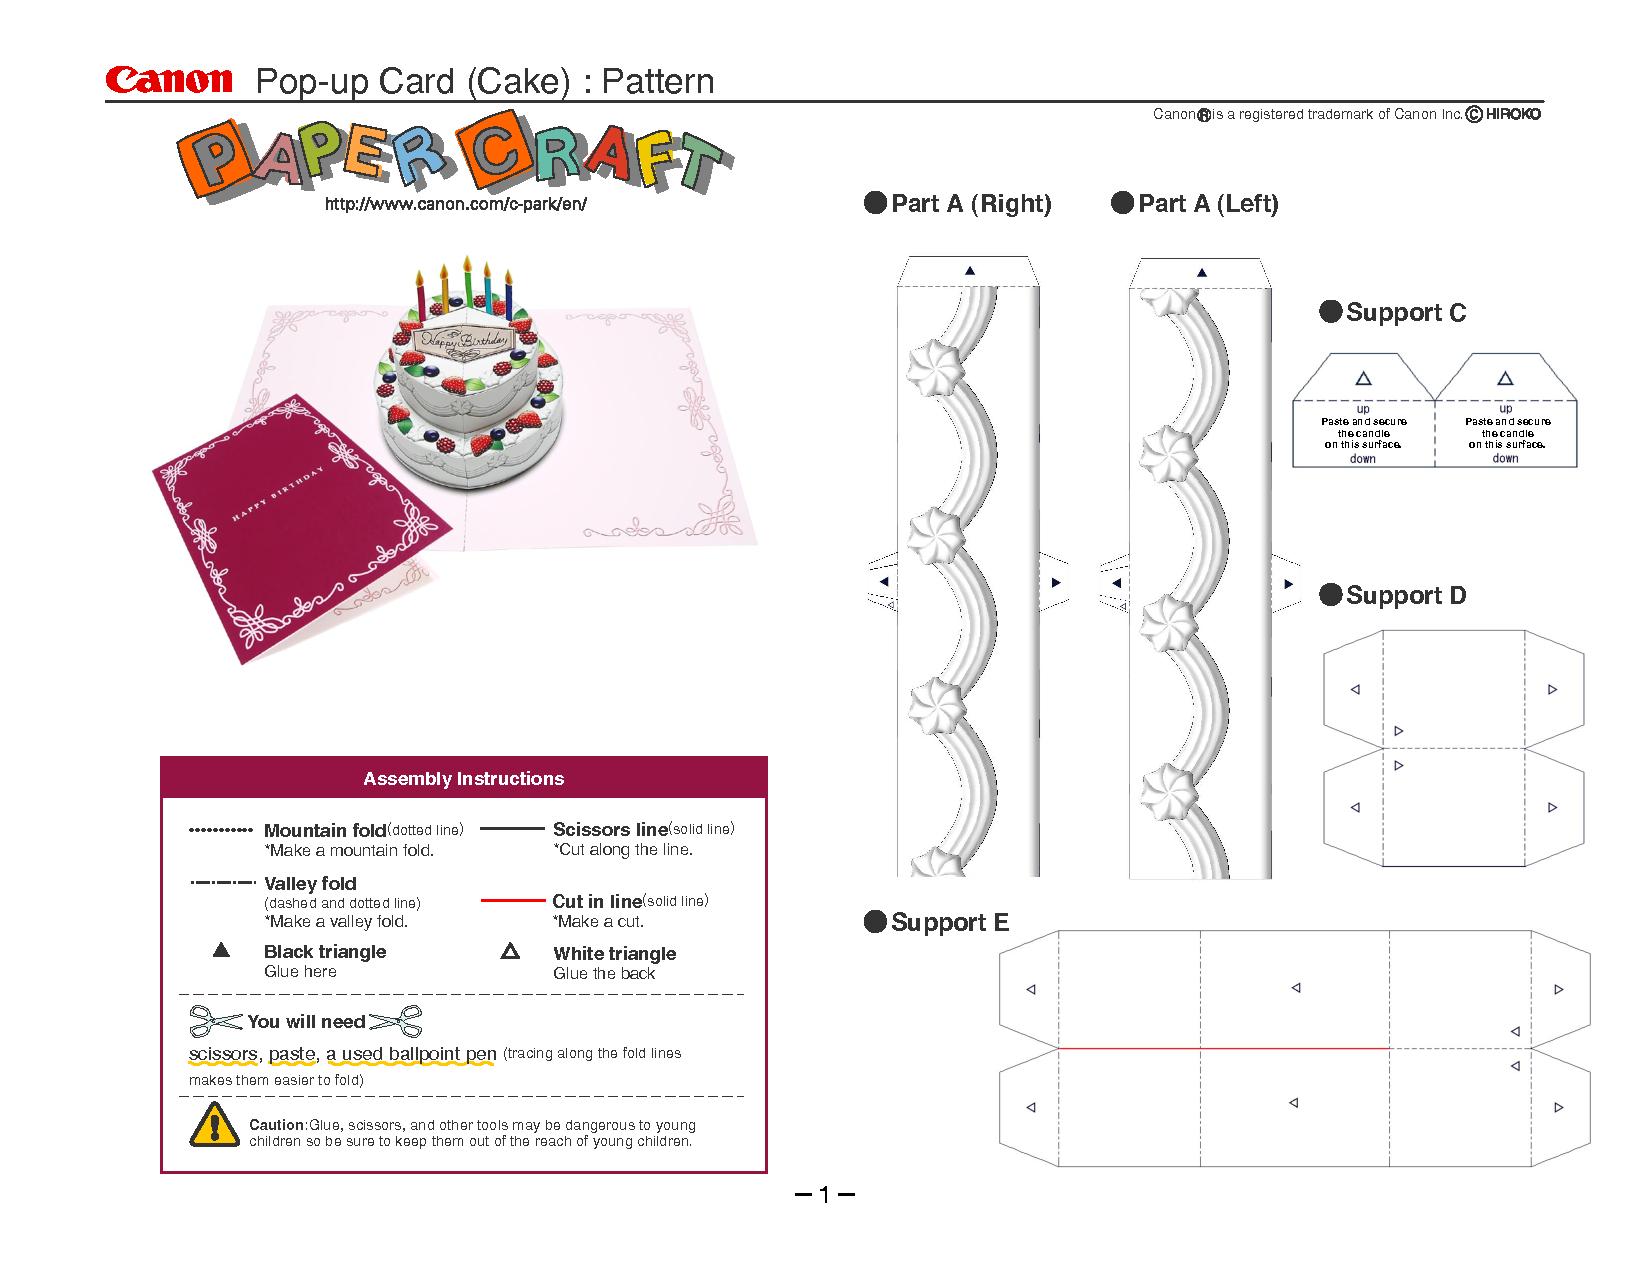 Birthday Cake Pop-Up Card Template   Cards   Pop Up Card Templates - Free Printable Pop Up Birthday Card Templates